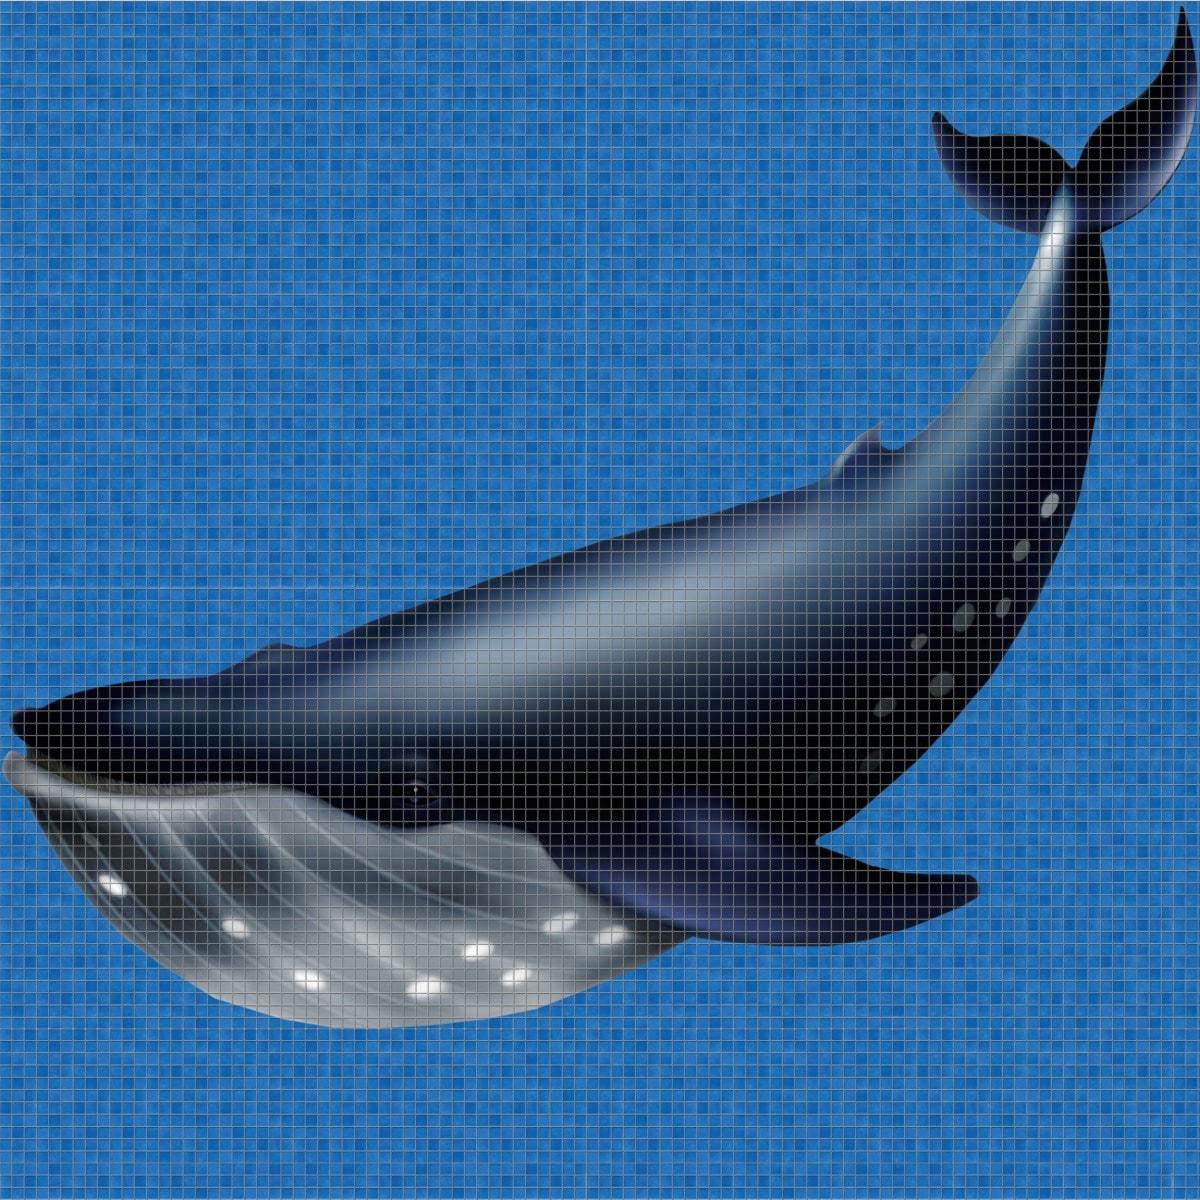 Whale-Digital-Print-Mosaic-Ezarri.jpg